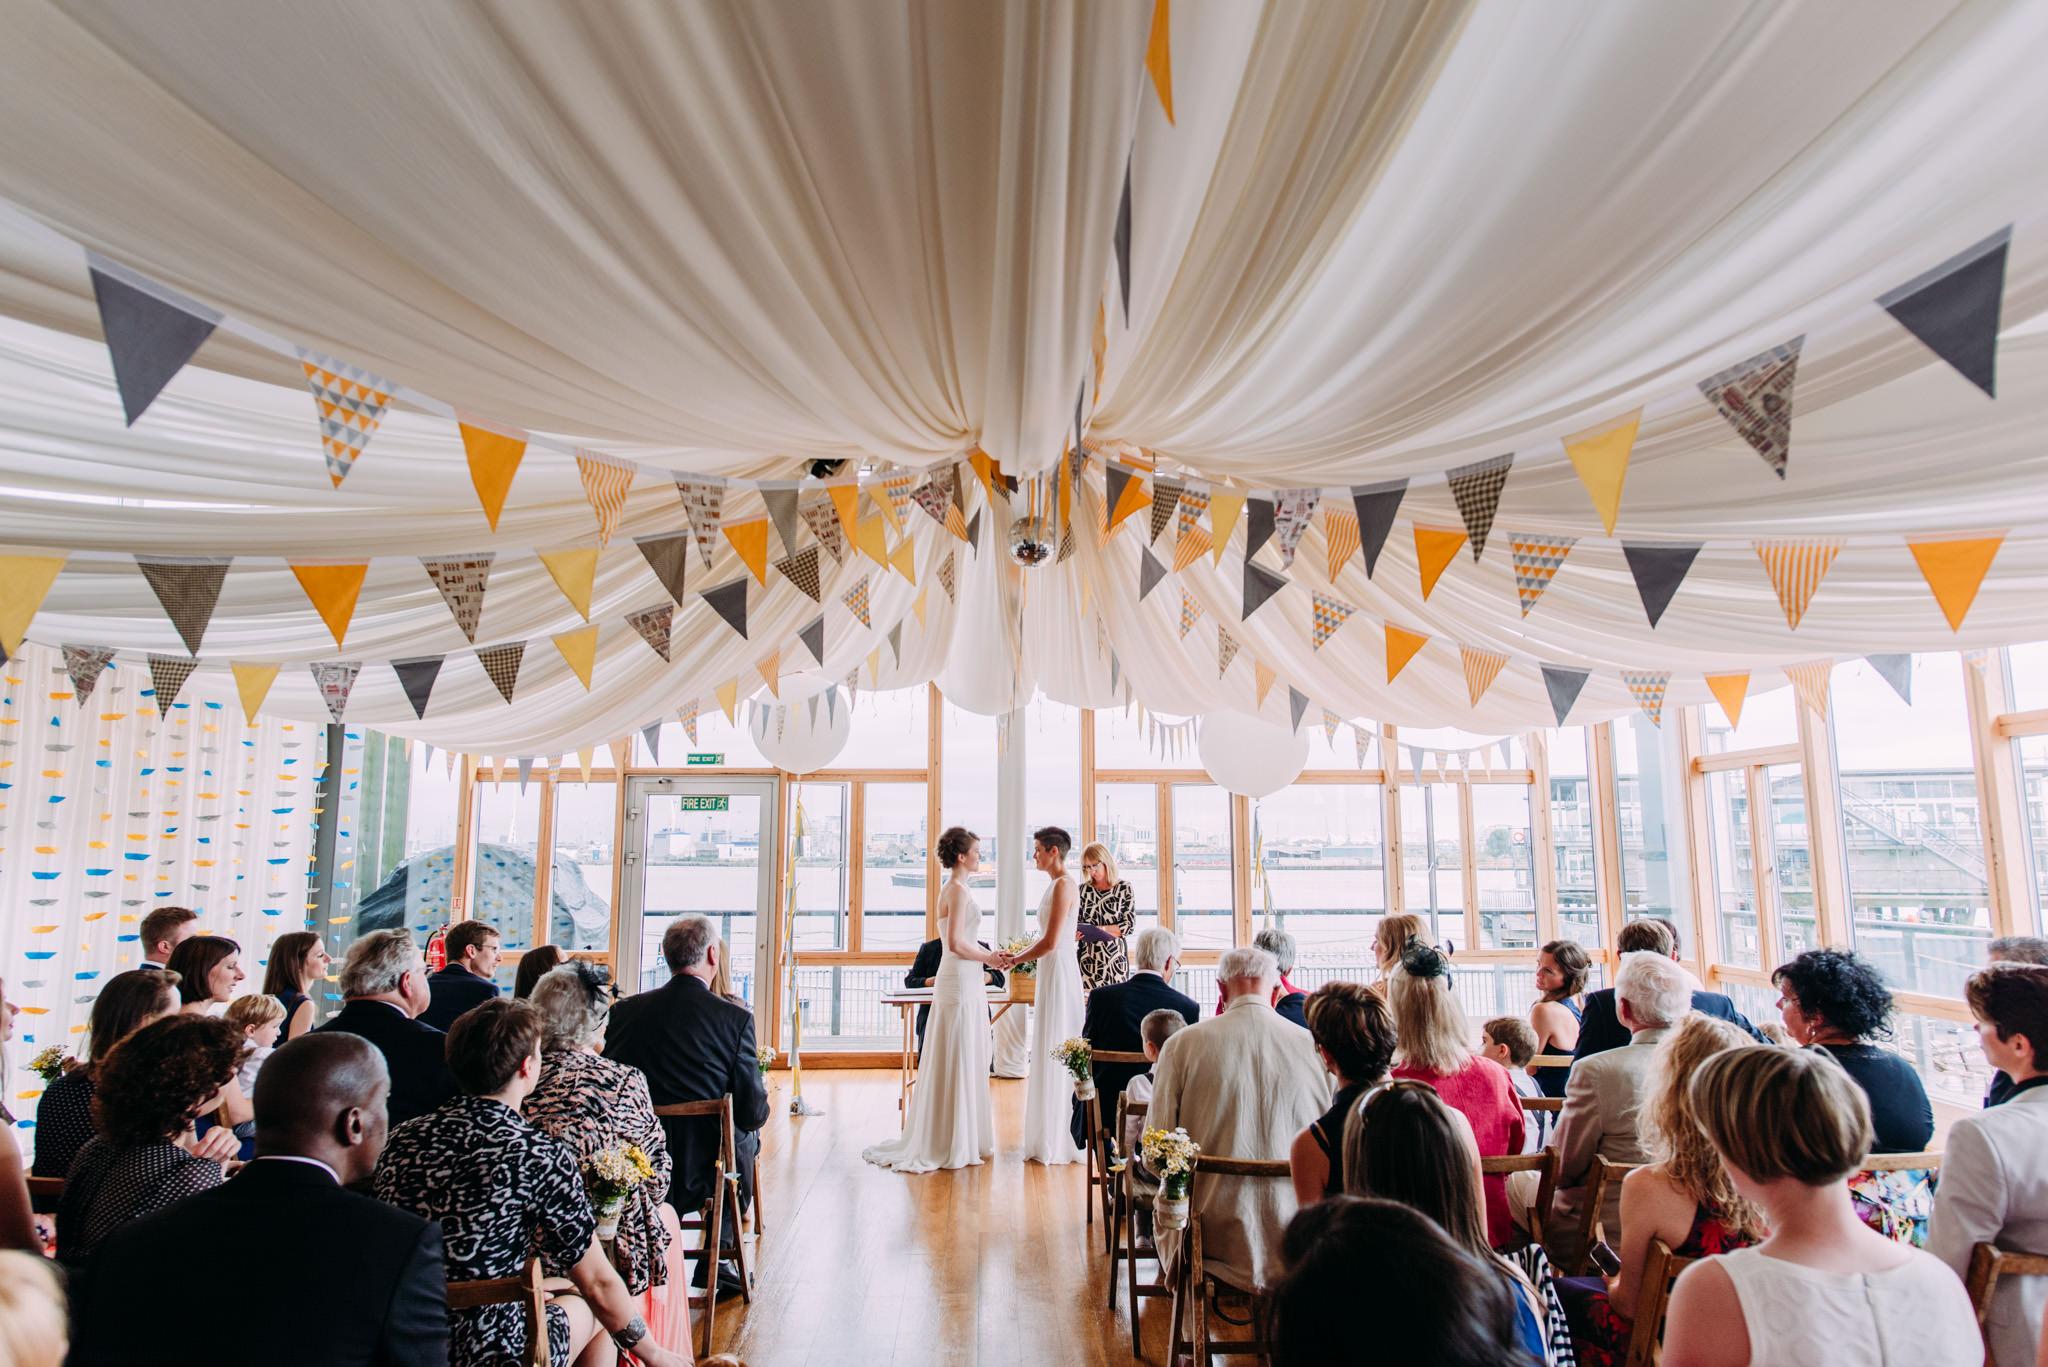 Same Sex Wedding At Greenwich Yacht Club In London With Diy Decor